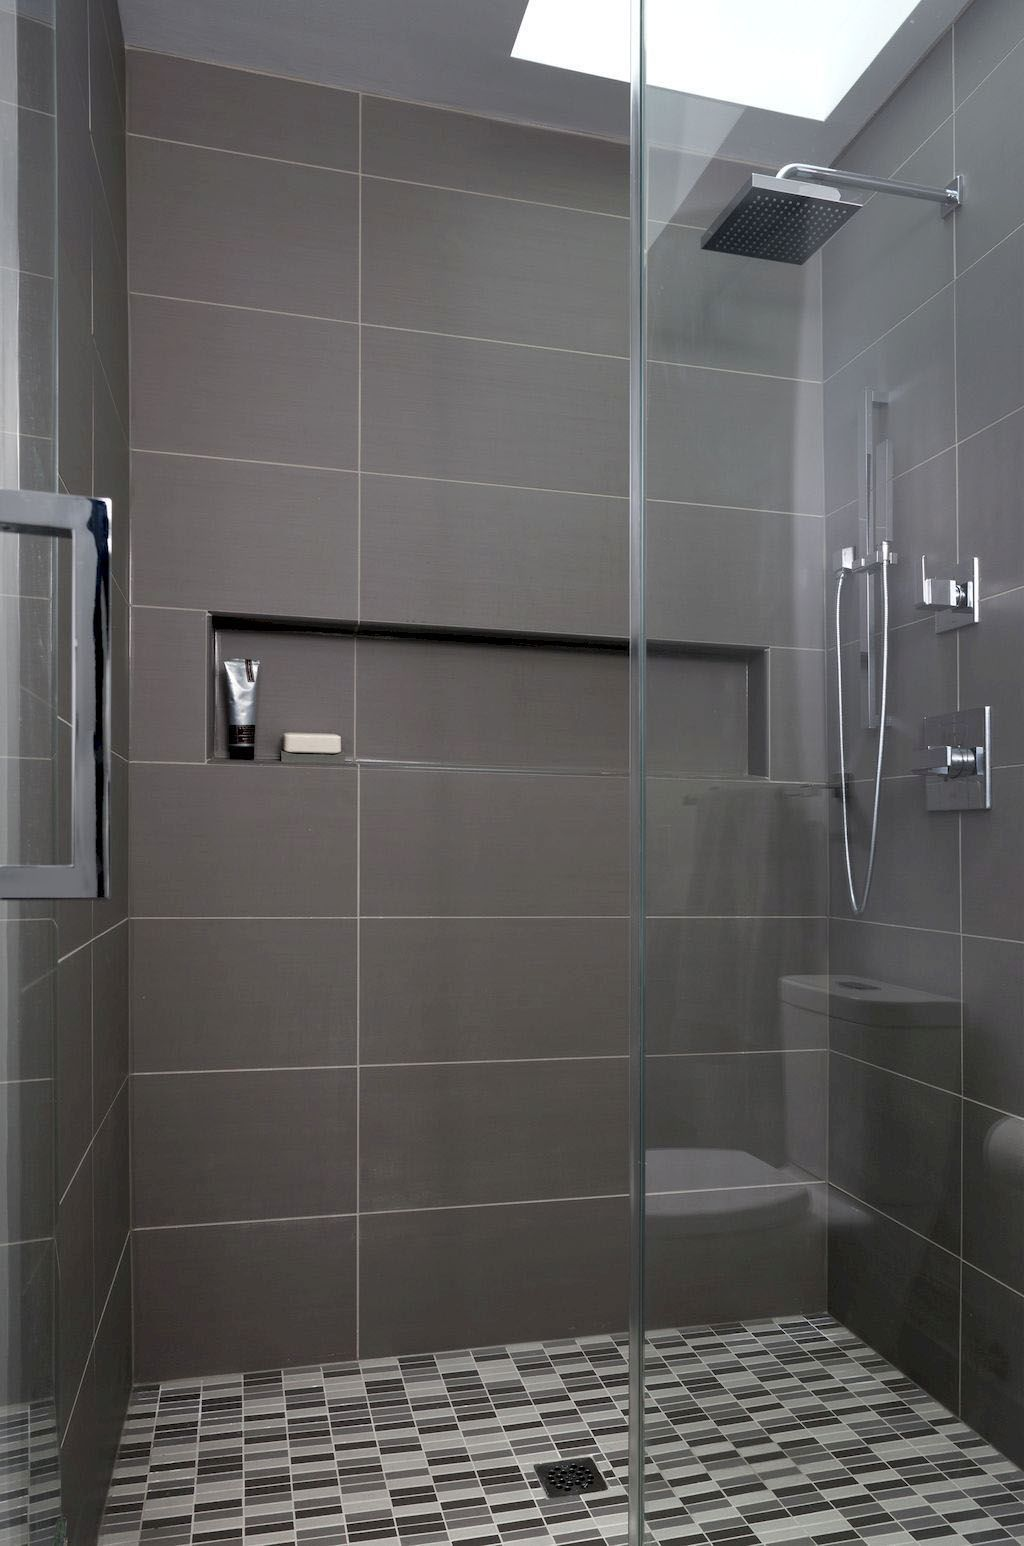 Advanced Bathroom Remodel Ideas 2018 Just On Interioropedia Home Design Bathroom Design Small Modern Modern Bathroom Design Master Bathroom Renovation